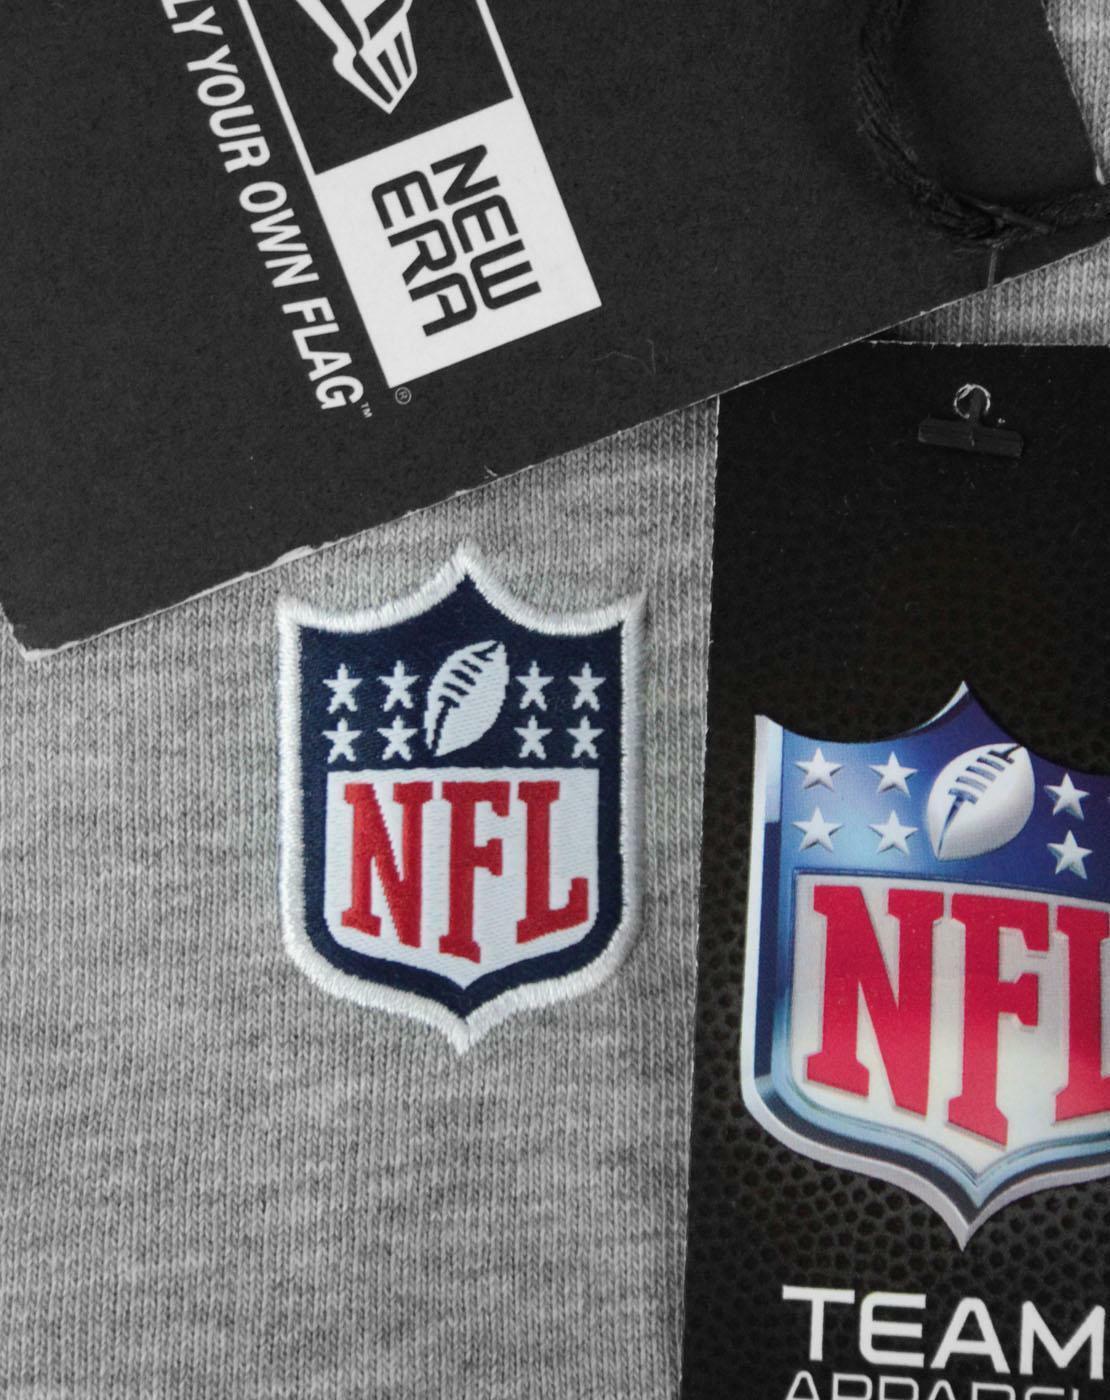 New-Era-NFL-Chicago-Bears-Vintage-Number-Men-039-s-Sweater miniatura 9